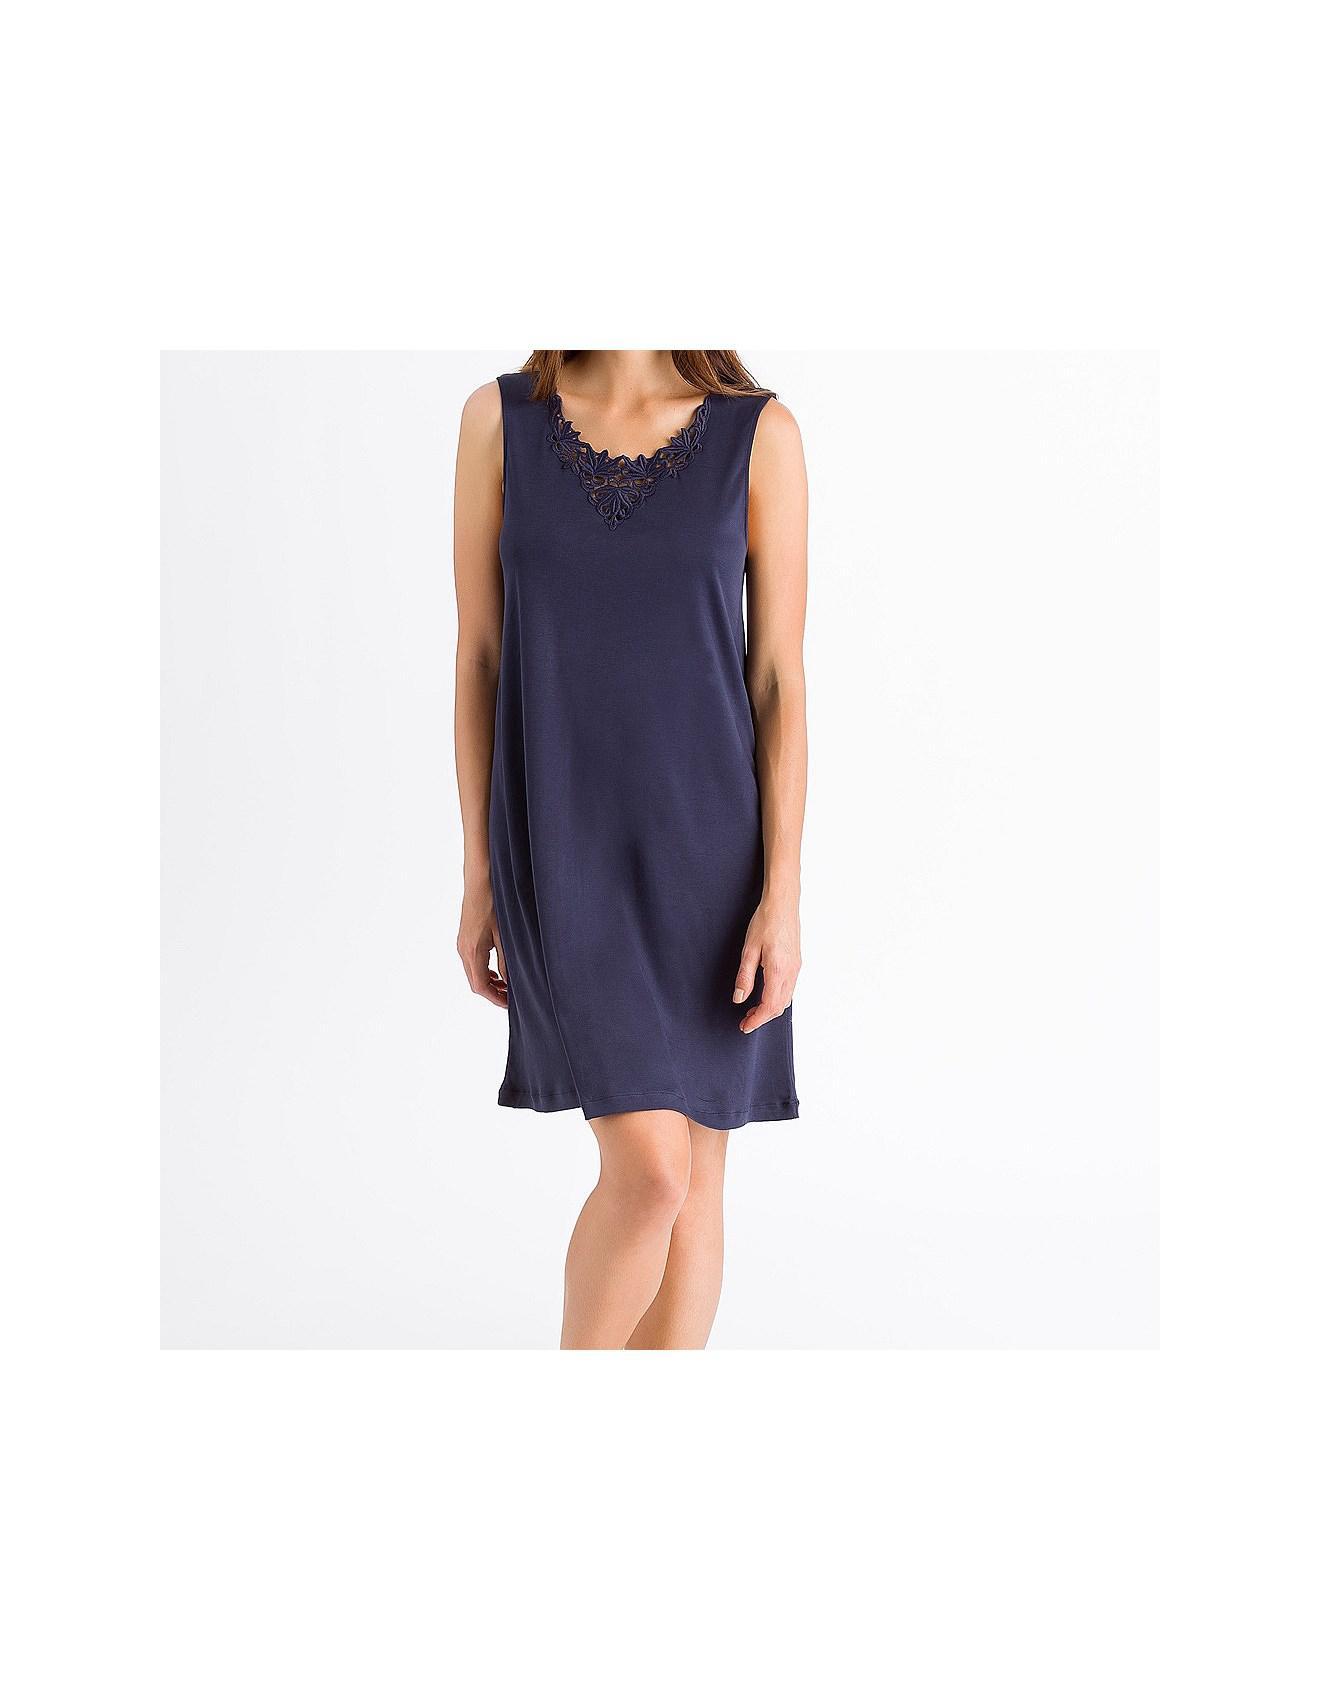 fdca5523ed Hanro Jasmin Sleeveless Nightie in Blue - Lyst